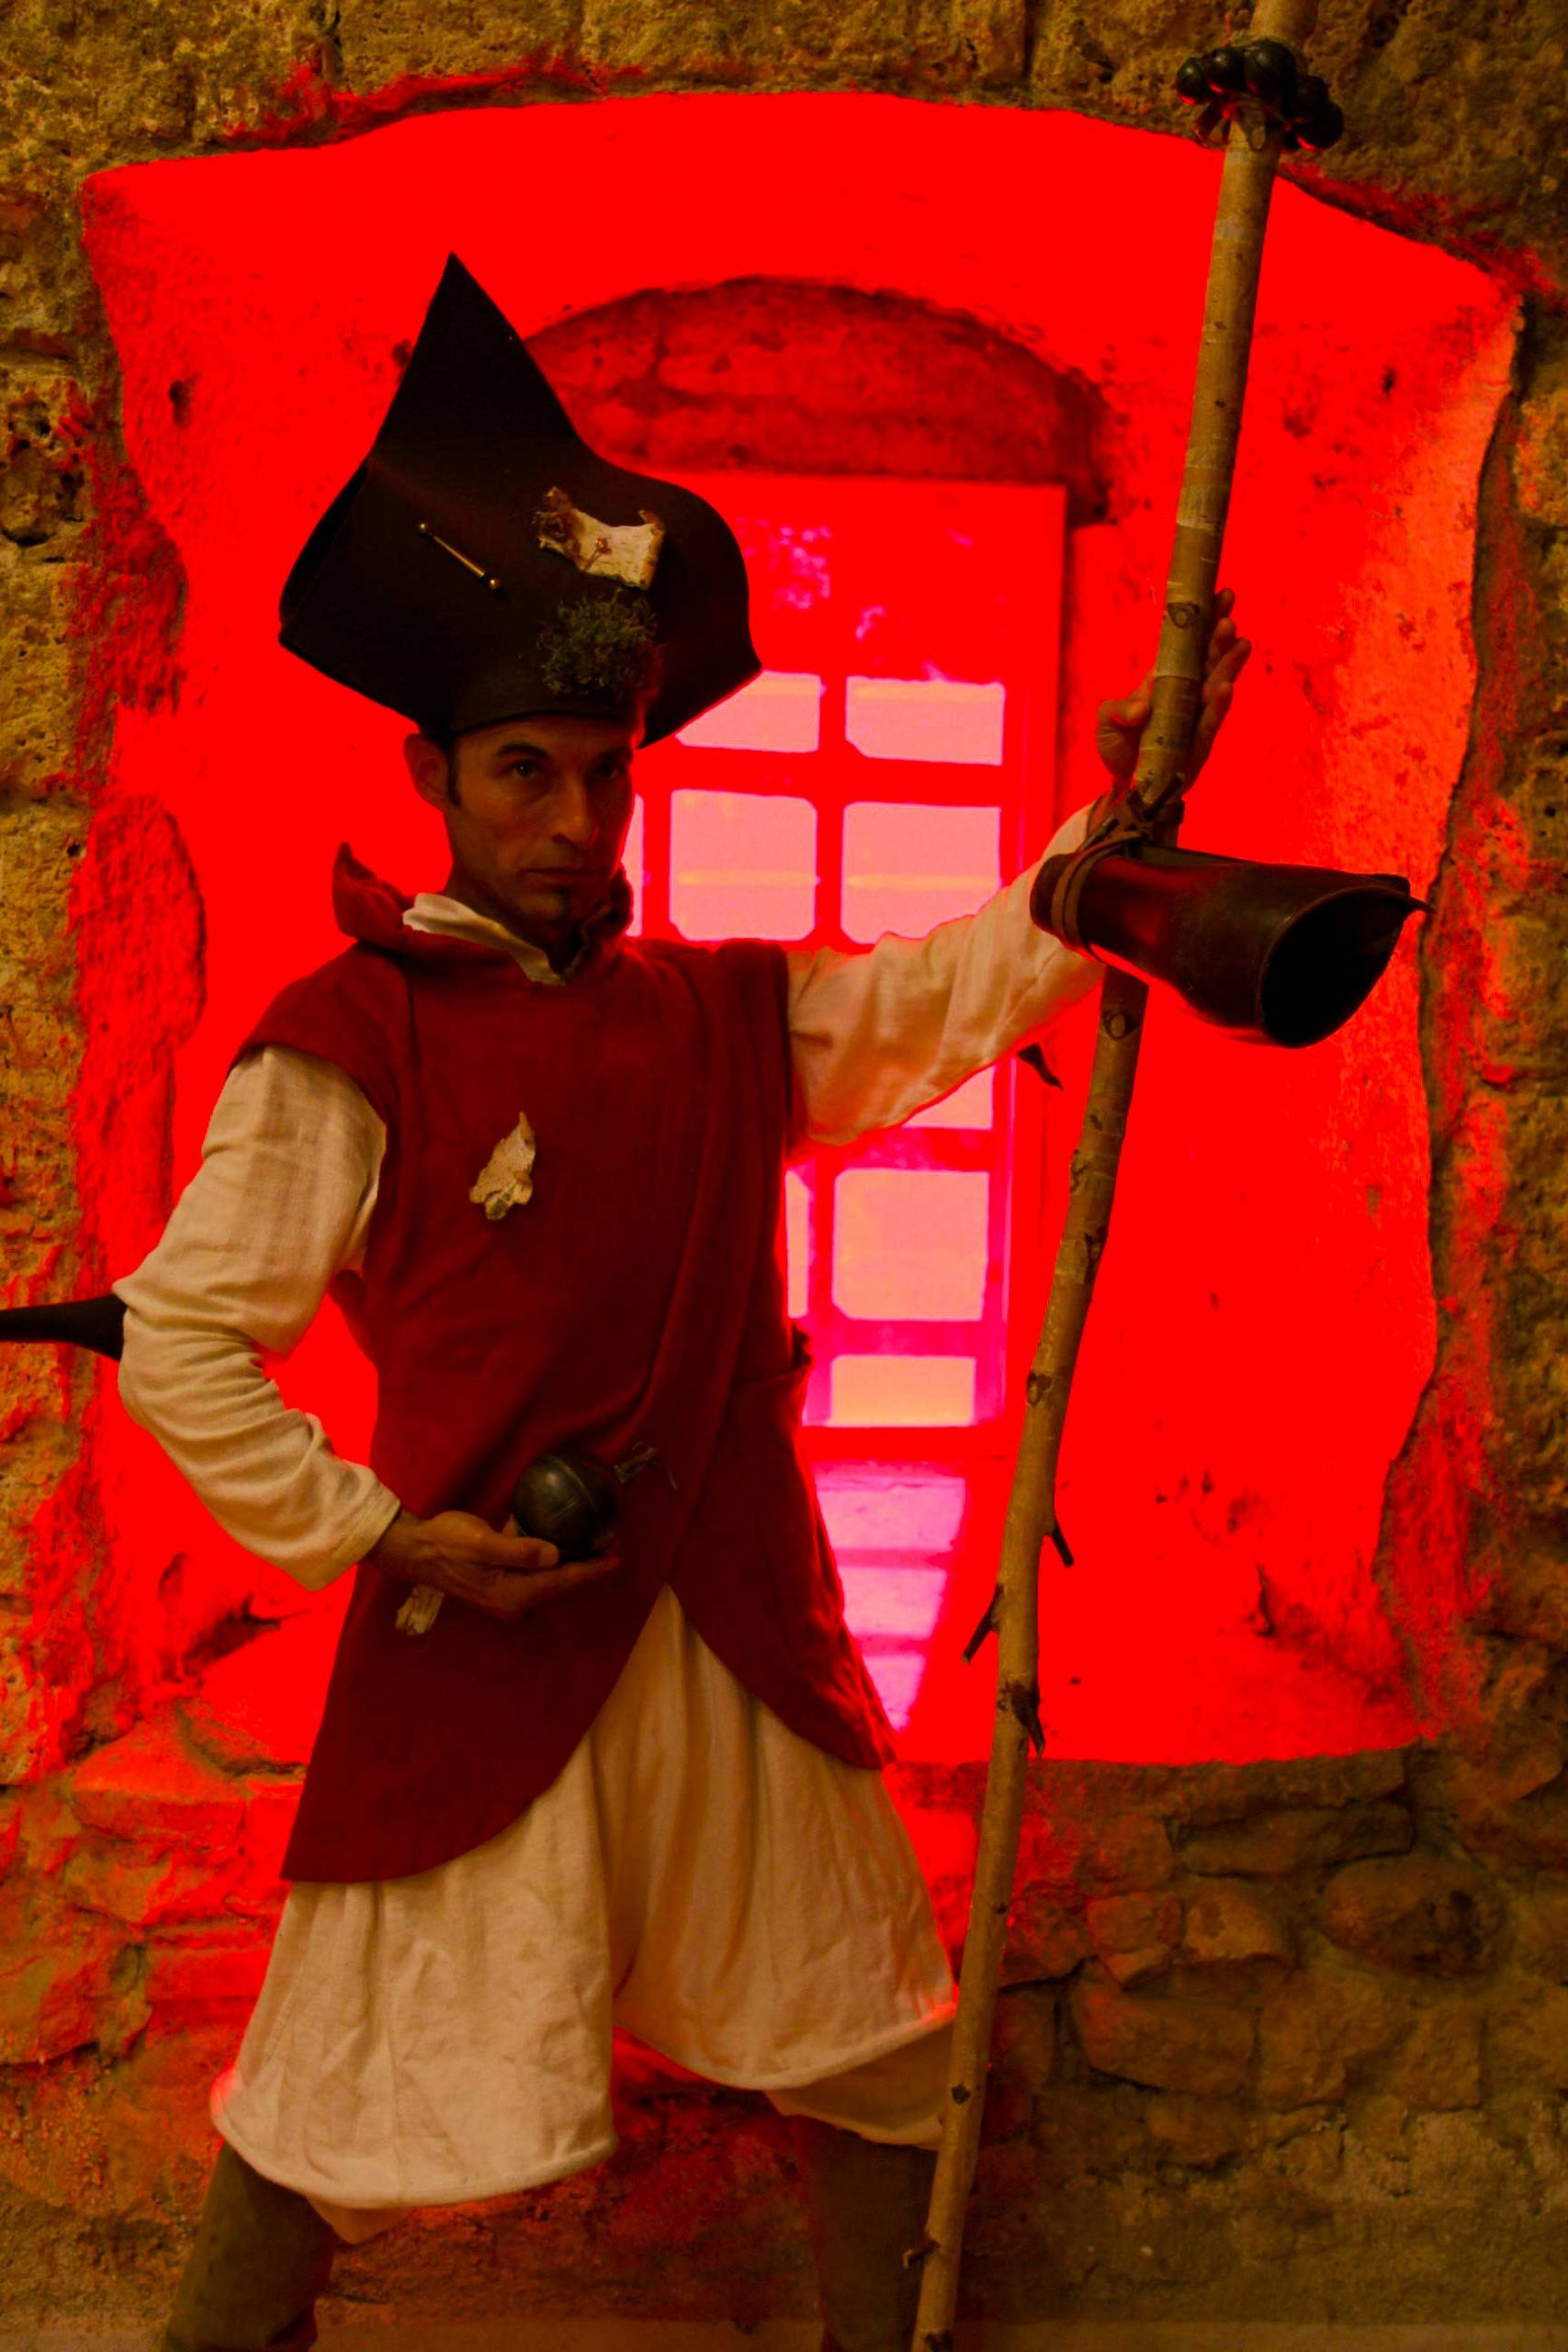 Maître Albertius, incarné par Manuel Gleyre, jongleur